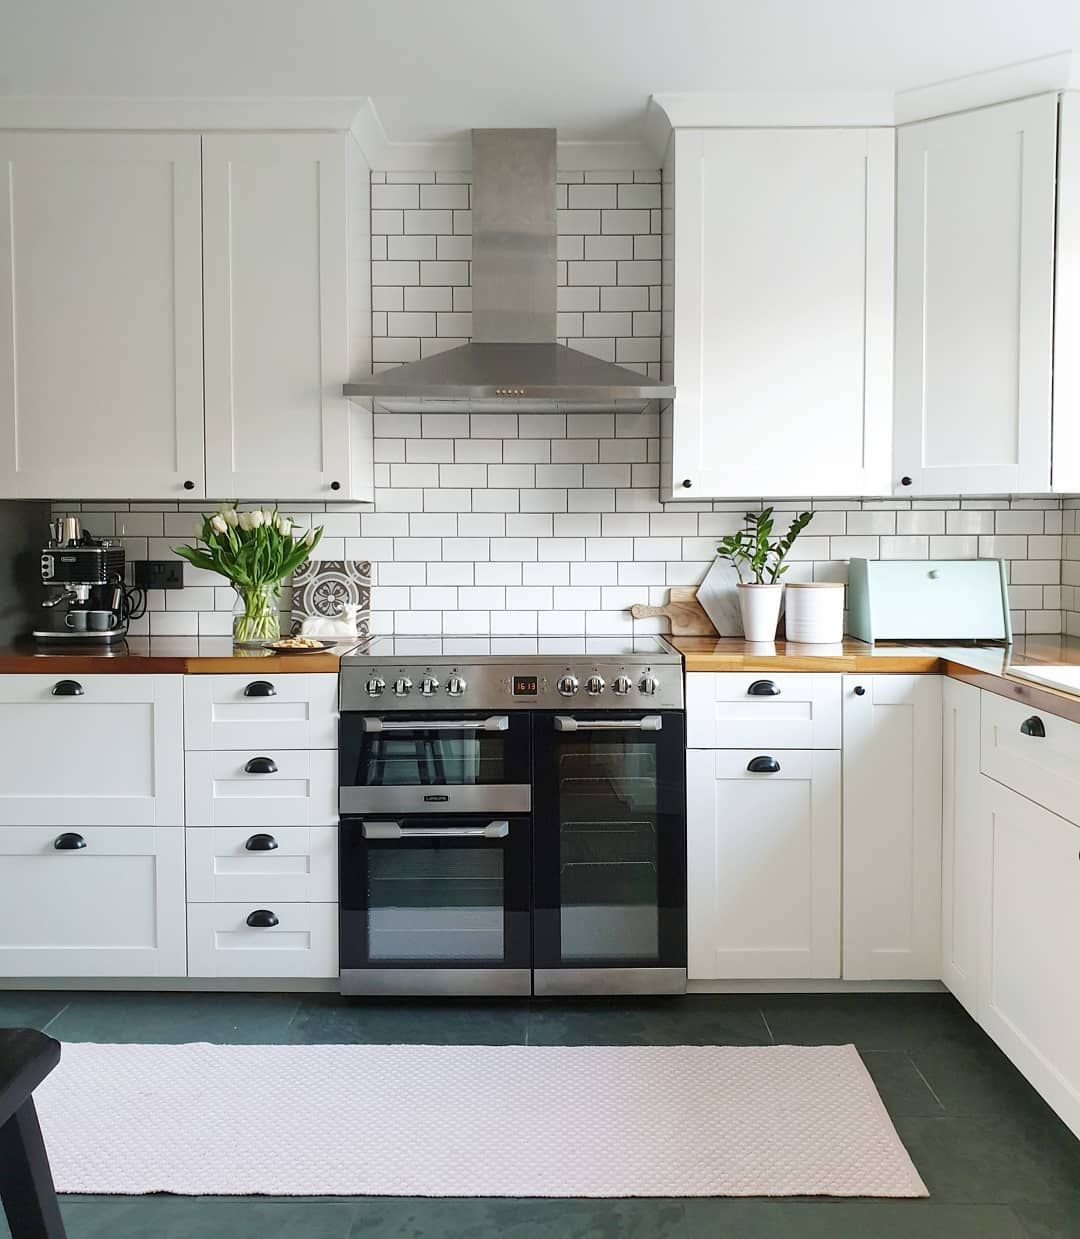 White IKEA kitchen. Black doorknobs and handles. Range